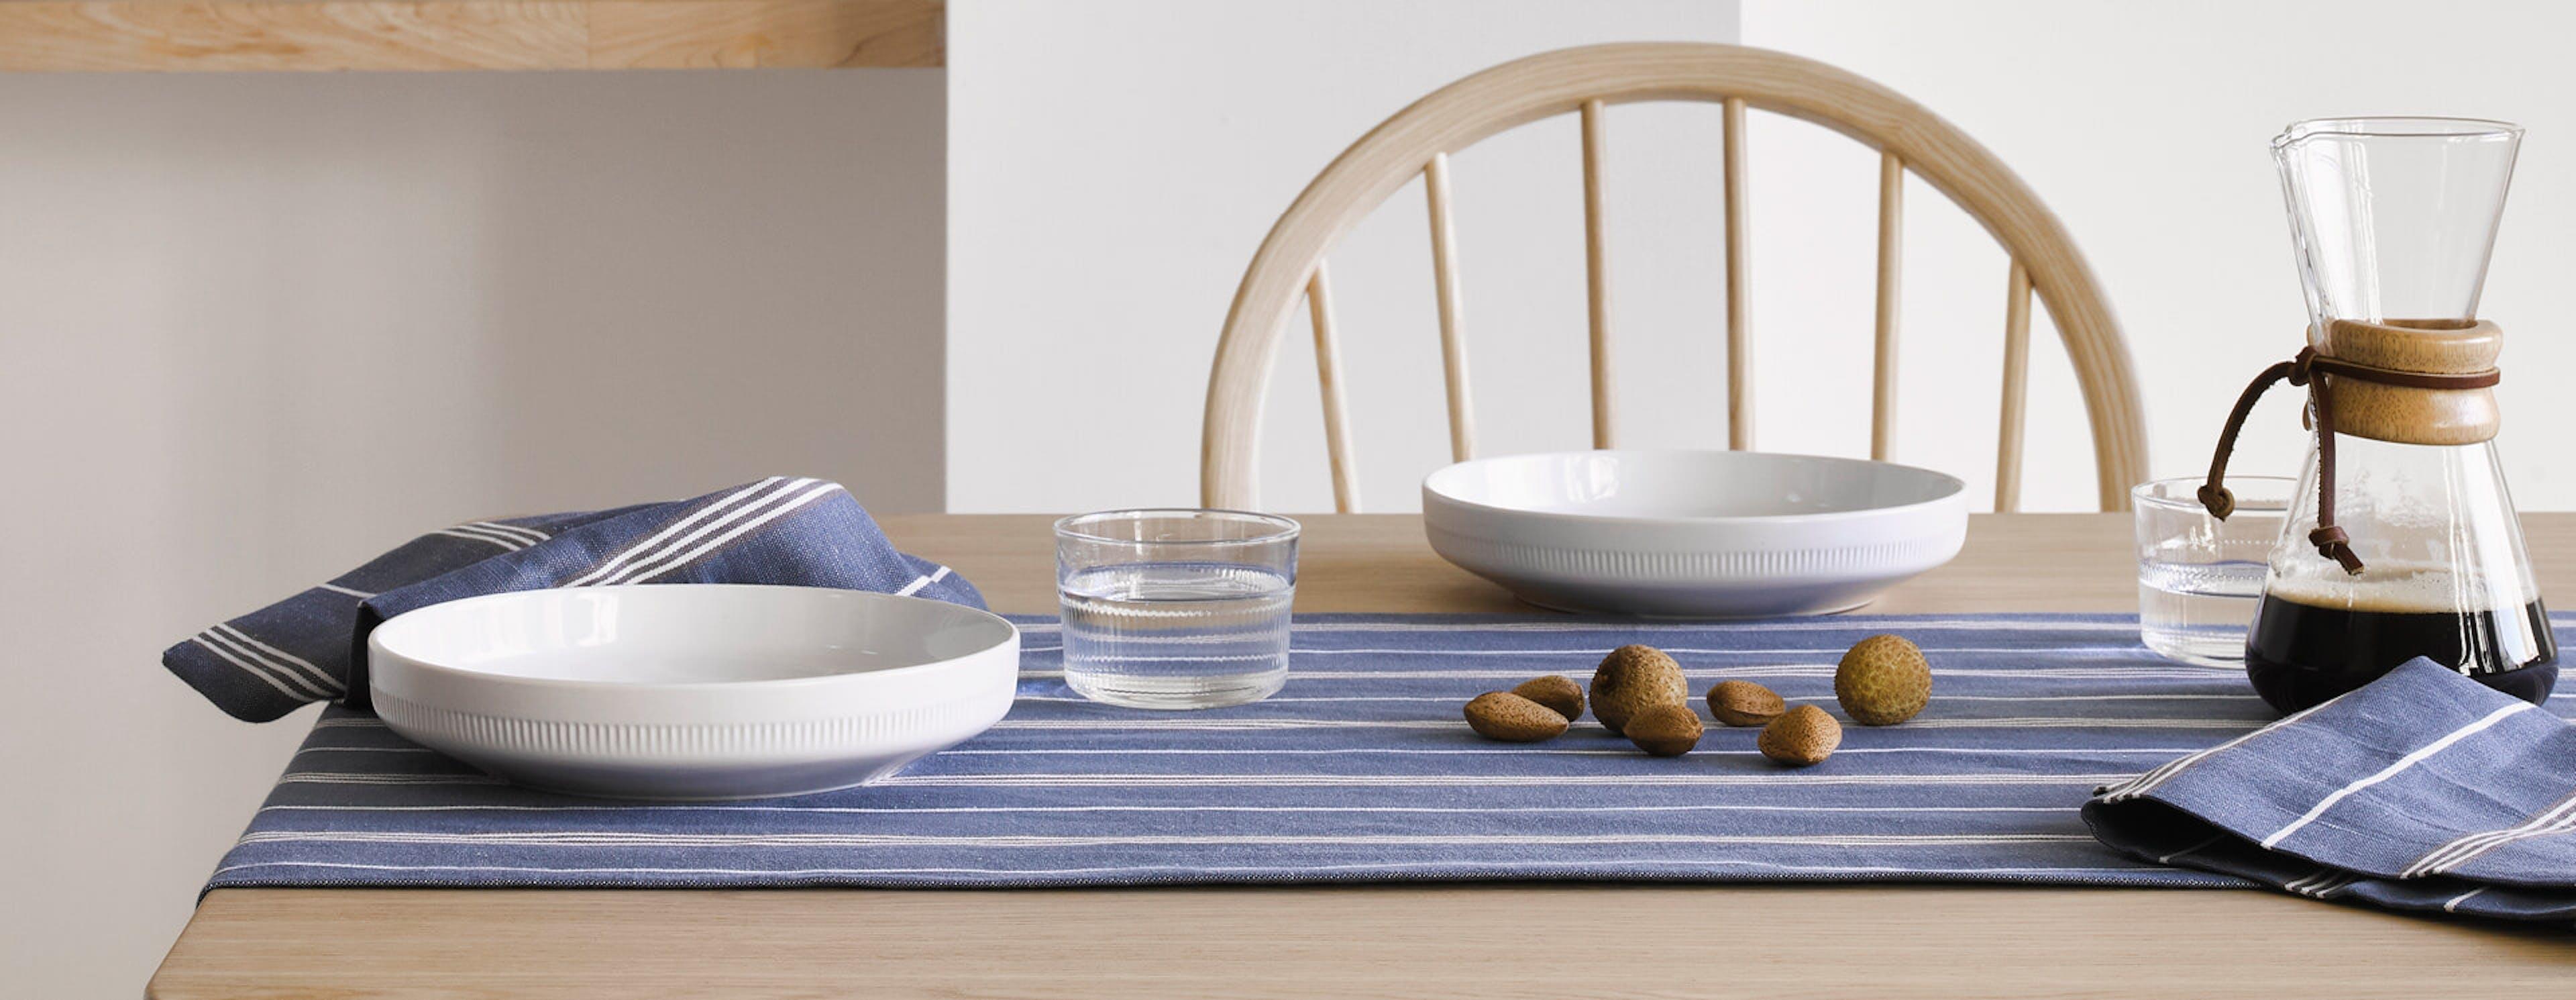 MARC O'POLO table and kitchen textiles